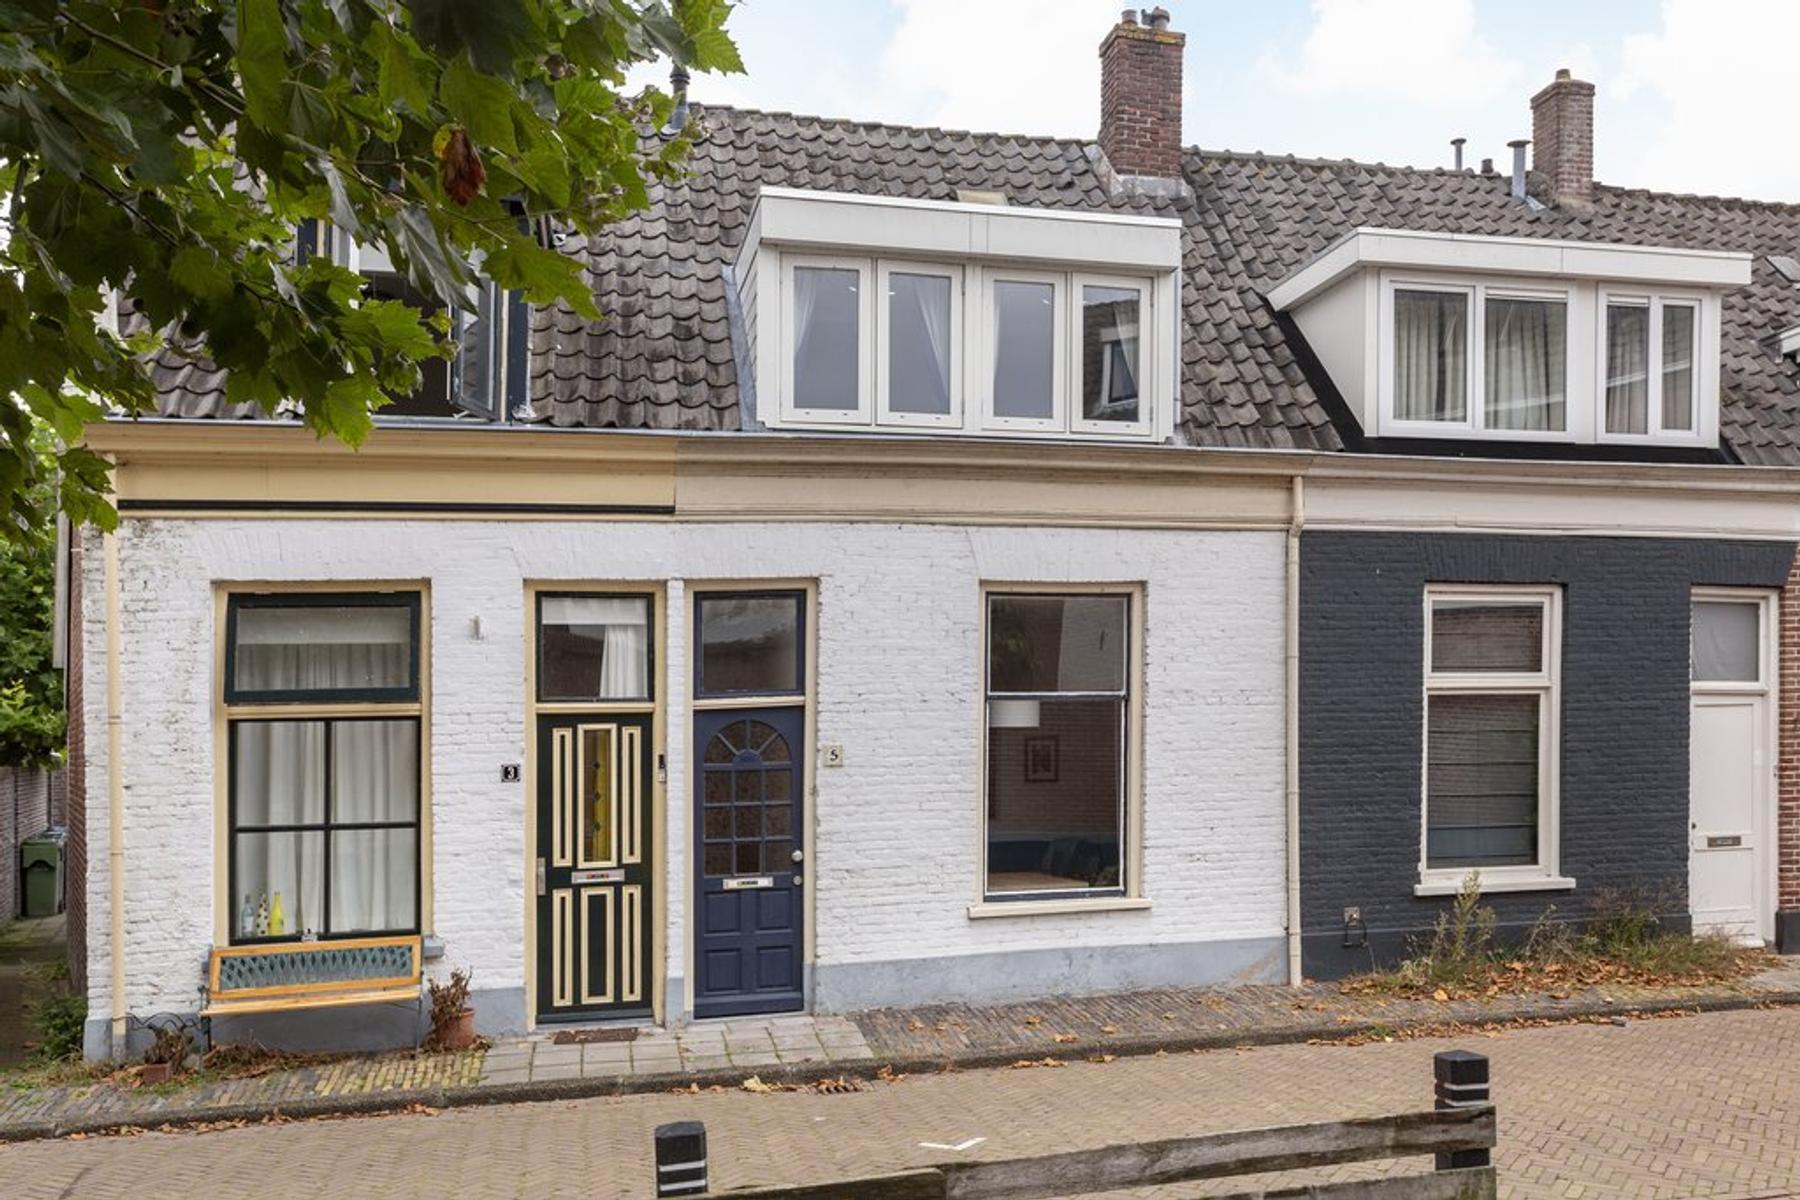 Molendwarsstraat 5 in Kampen 8261 LG